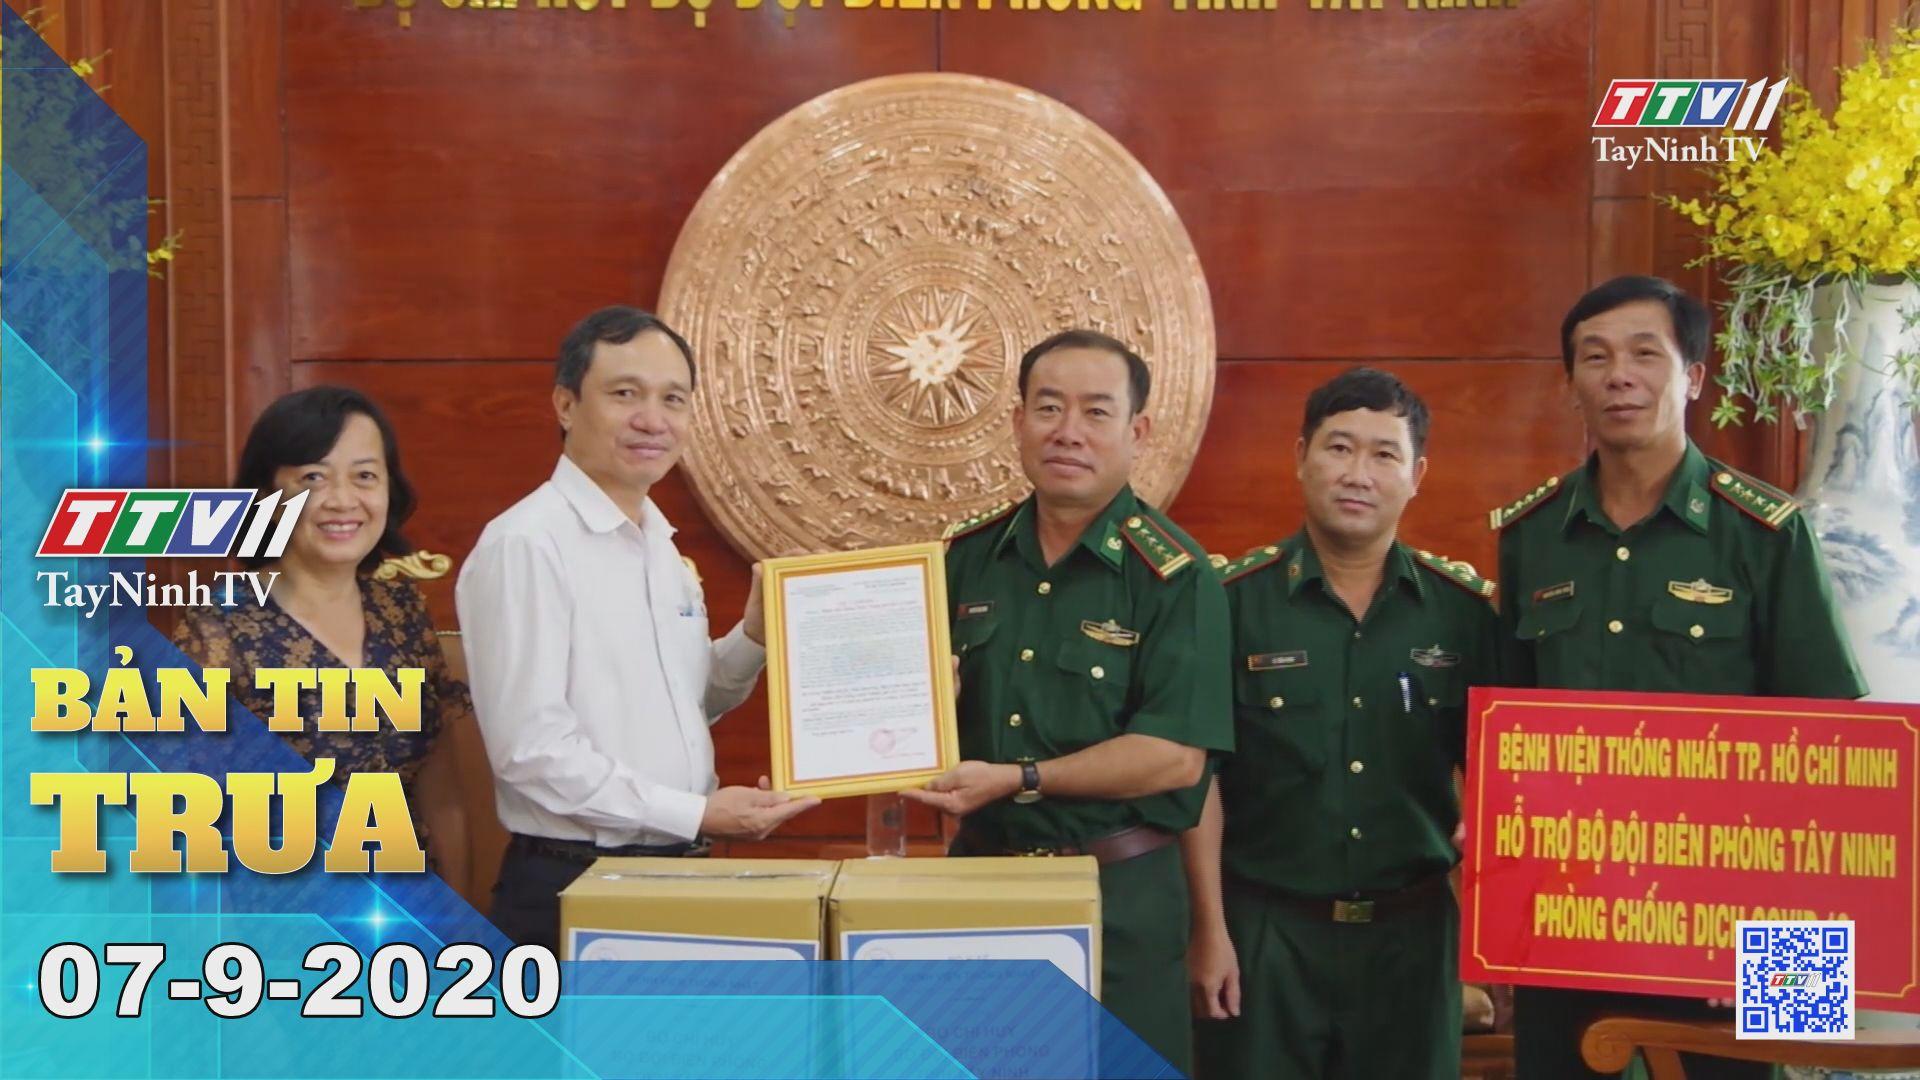 Bản tin trưa 07-9-2020 | Tin tức hôm nay | TayNinhTV